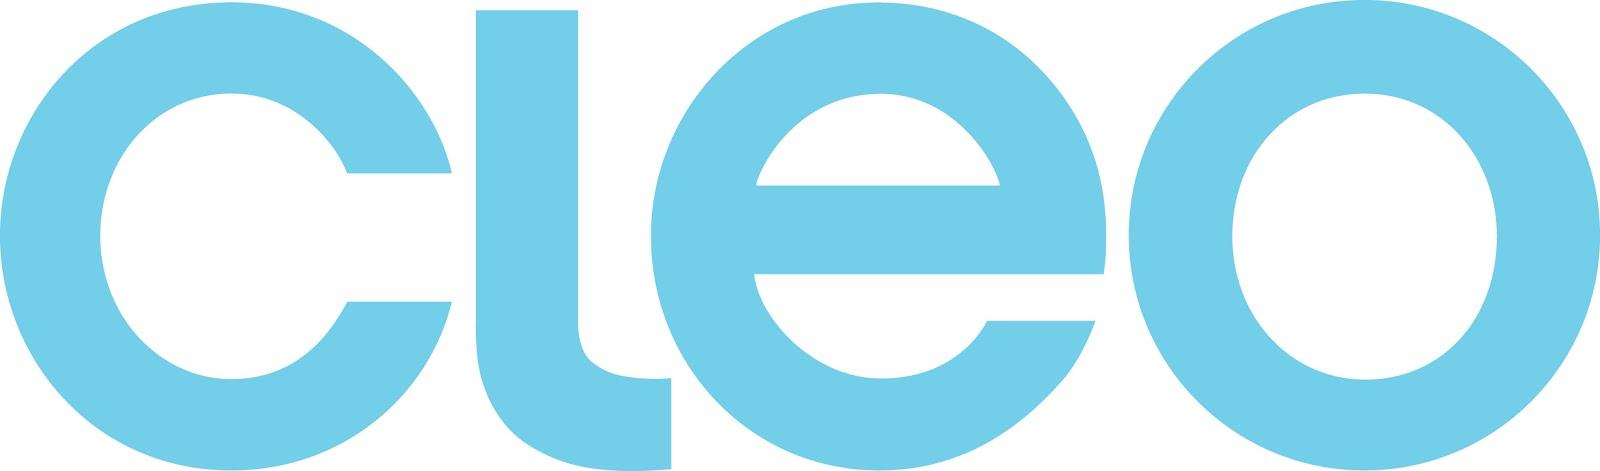 cleo logo.jpg